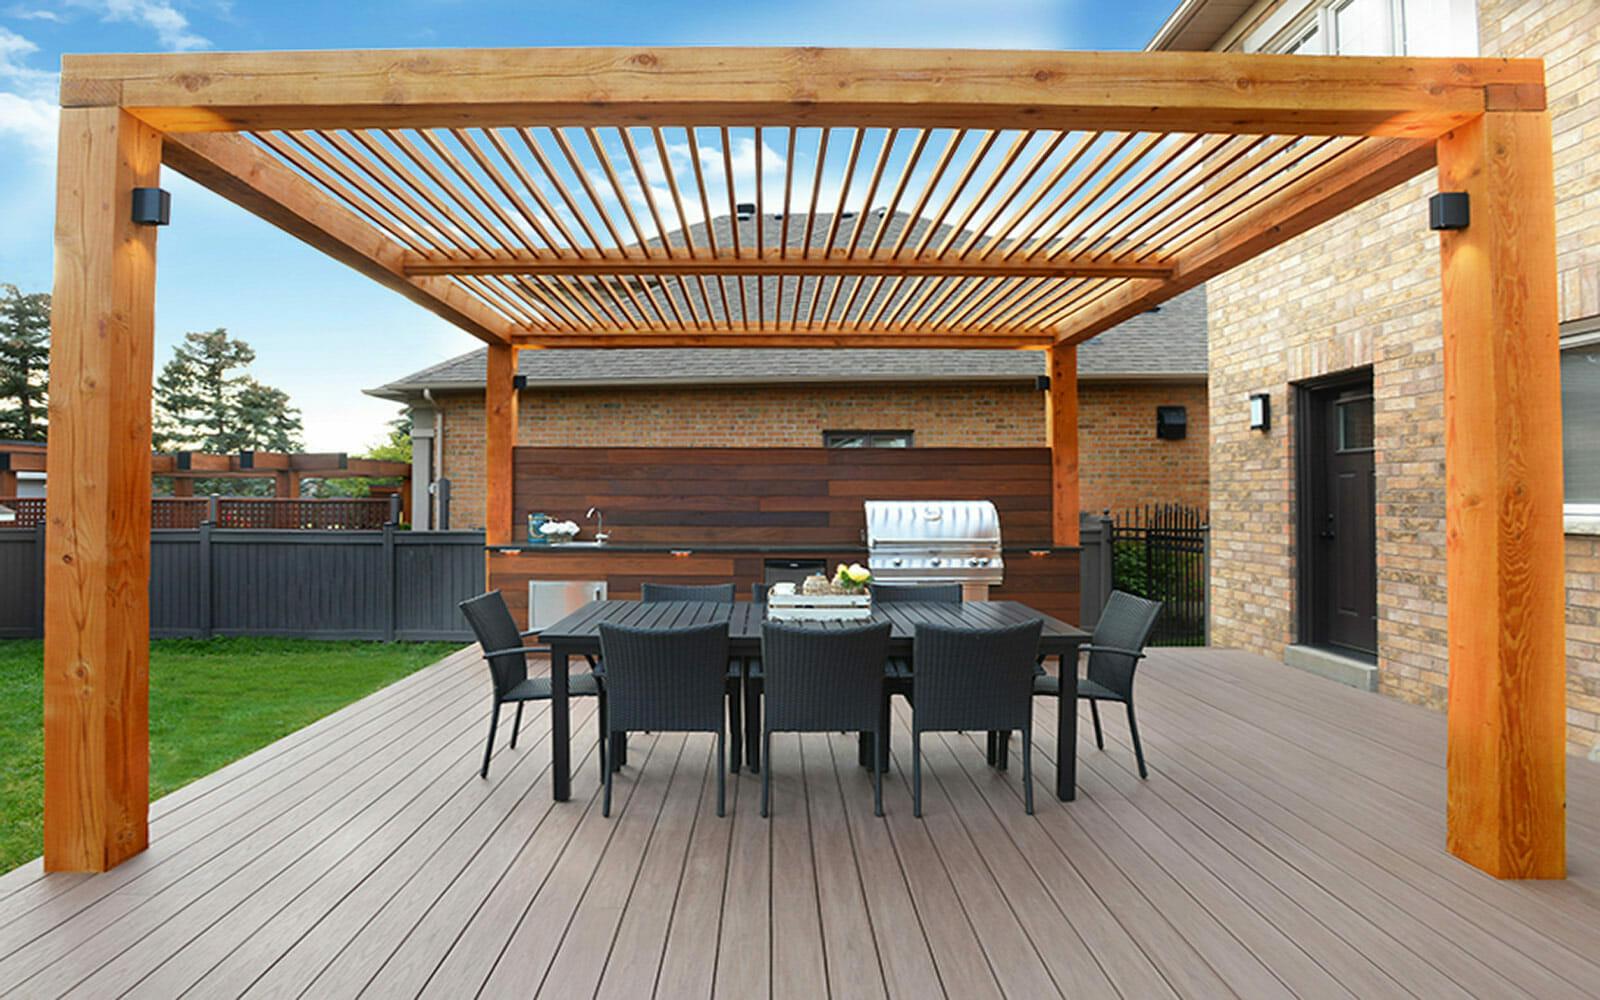 Decking Project by The Deck BuildersToronto; Featuring TimberTech Decks, Outdoor Kitchen & Woodworking.